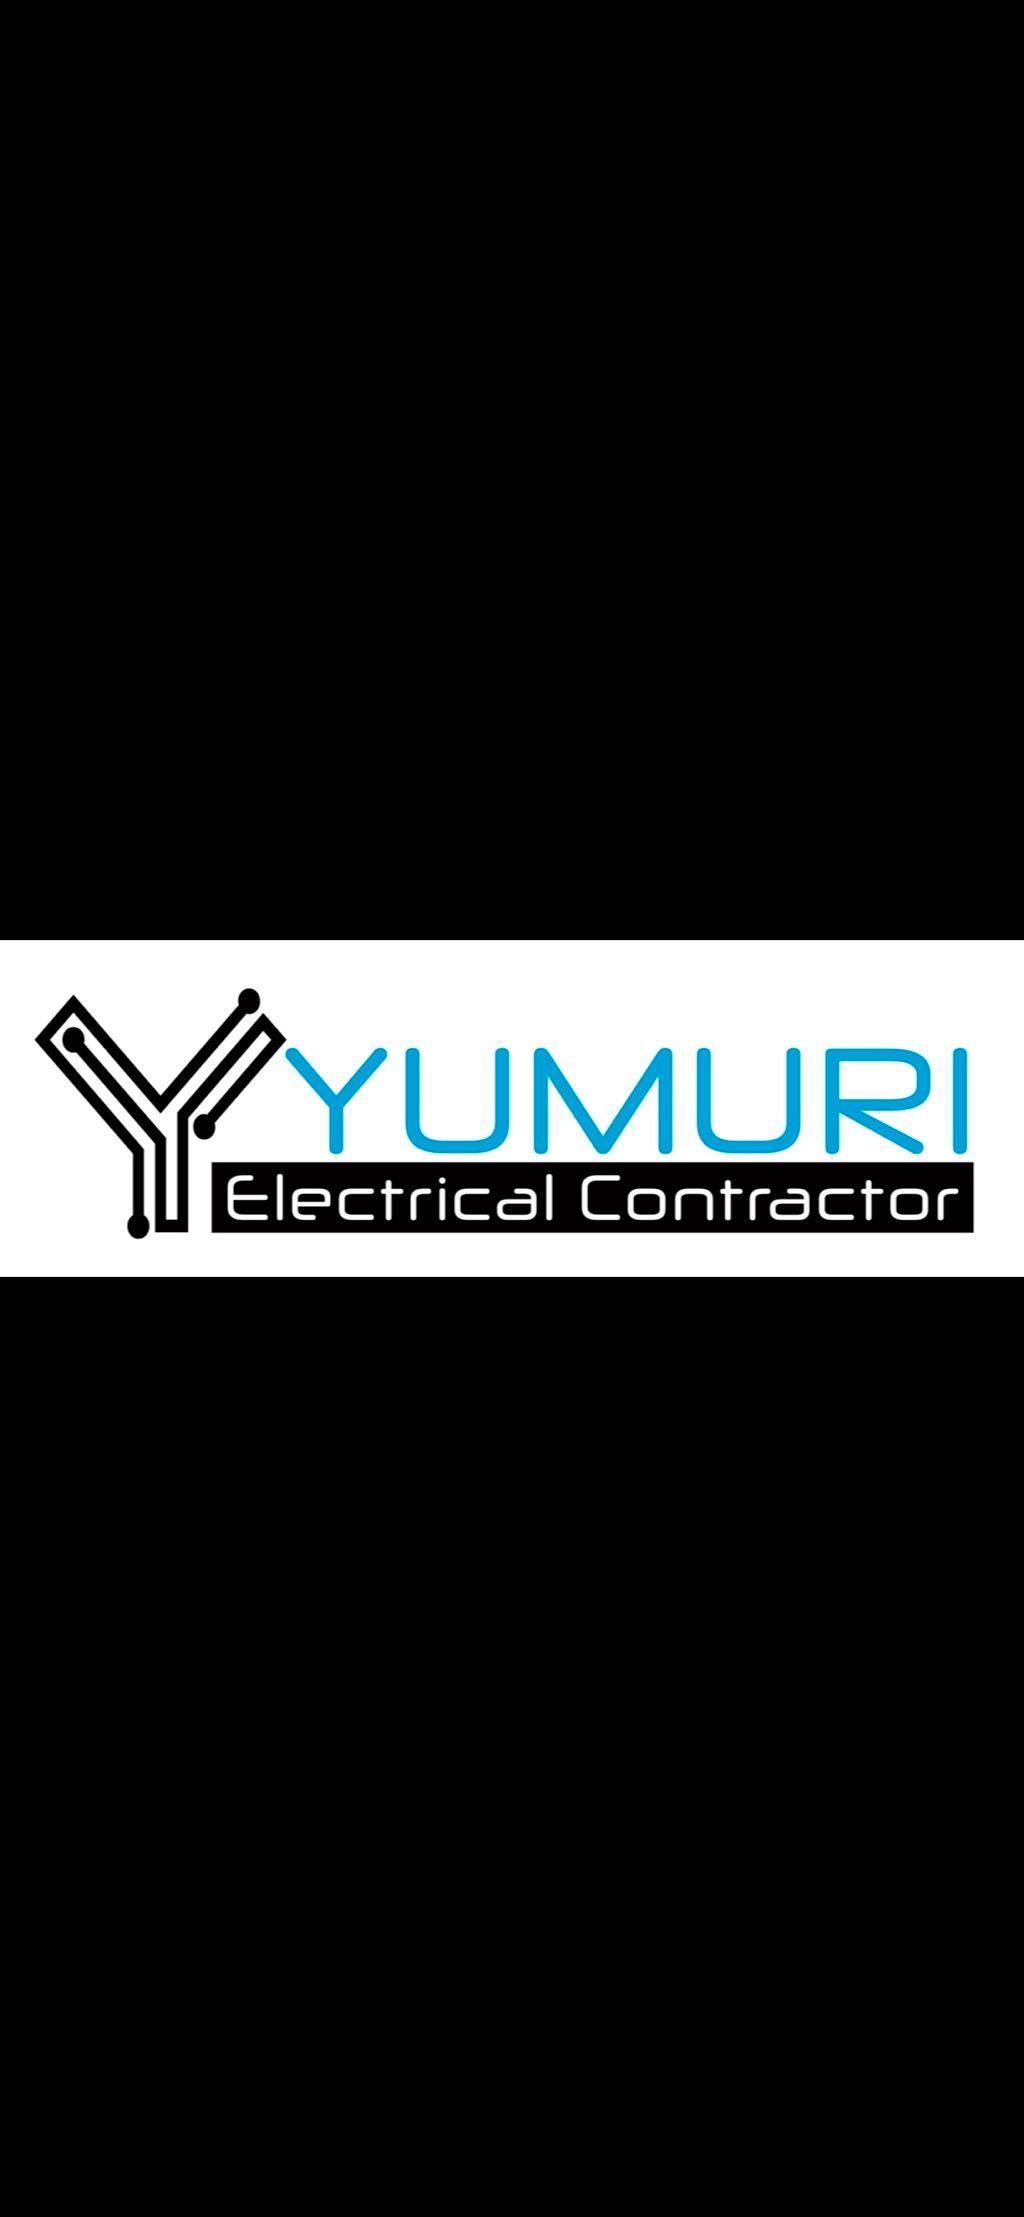 Yumuri Electrical Contracting Inc.